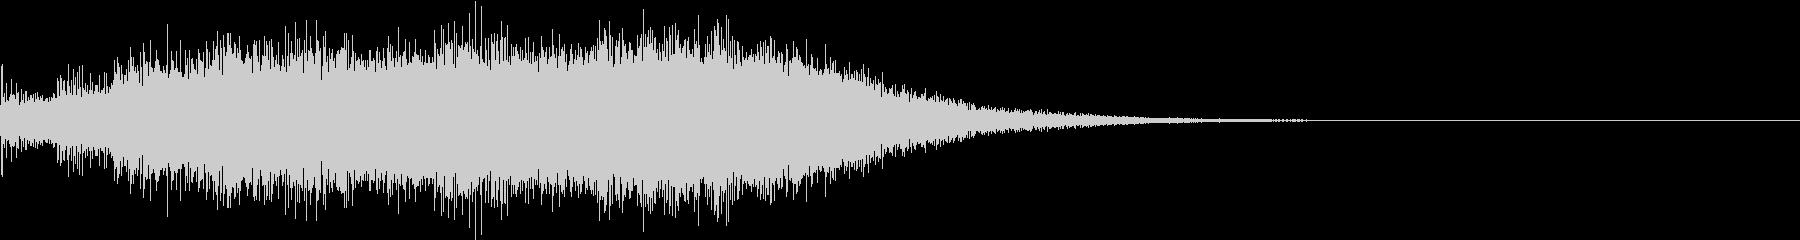 Logo アプリ起動音・企業サウンドロゴの未再生の波形